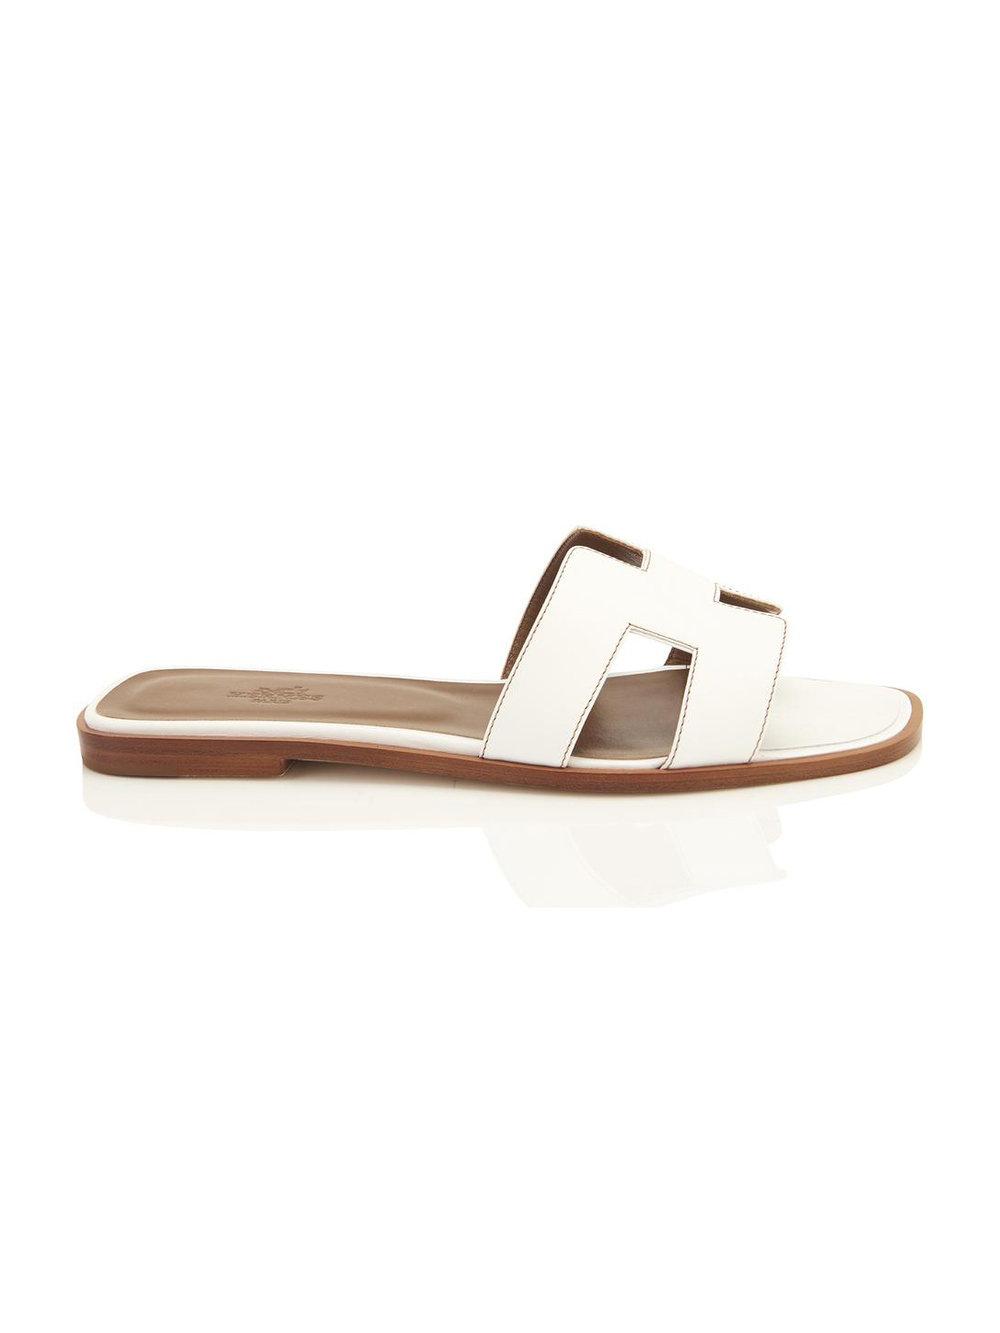 hermes-white-oran-orans-flat-39-sandals-size-us-85-regular-m-b-21753760-3-0.jpg